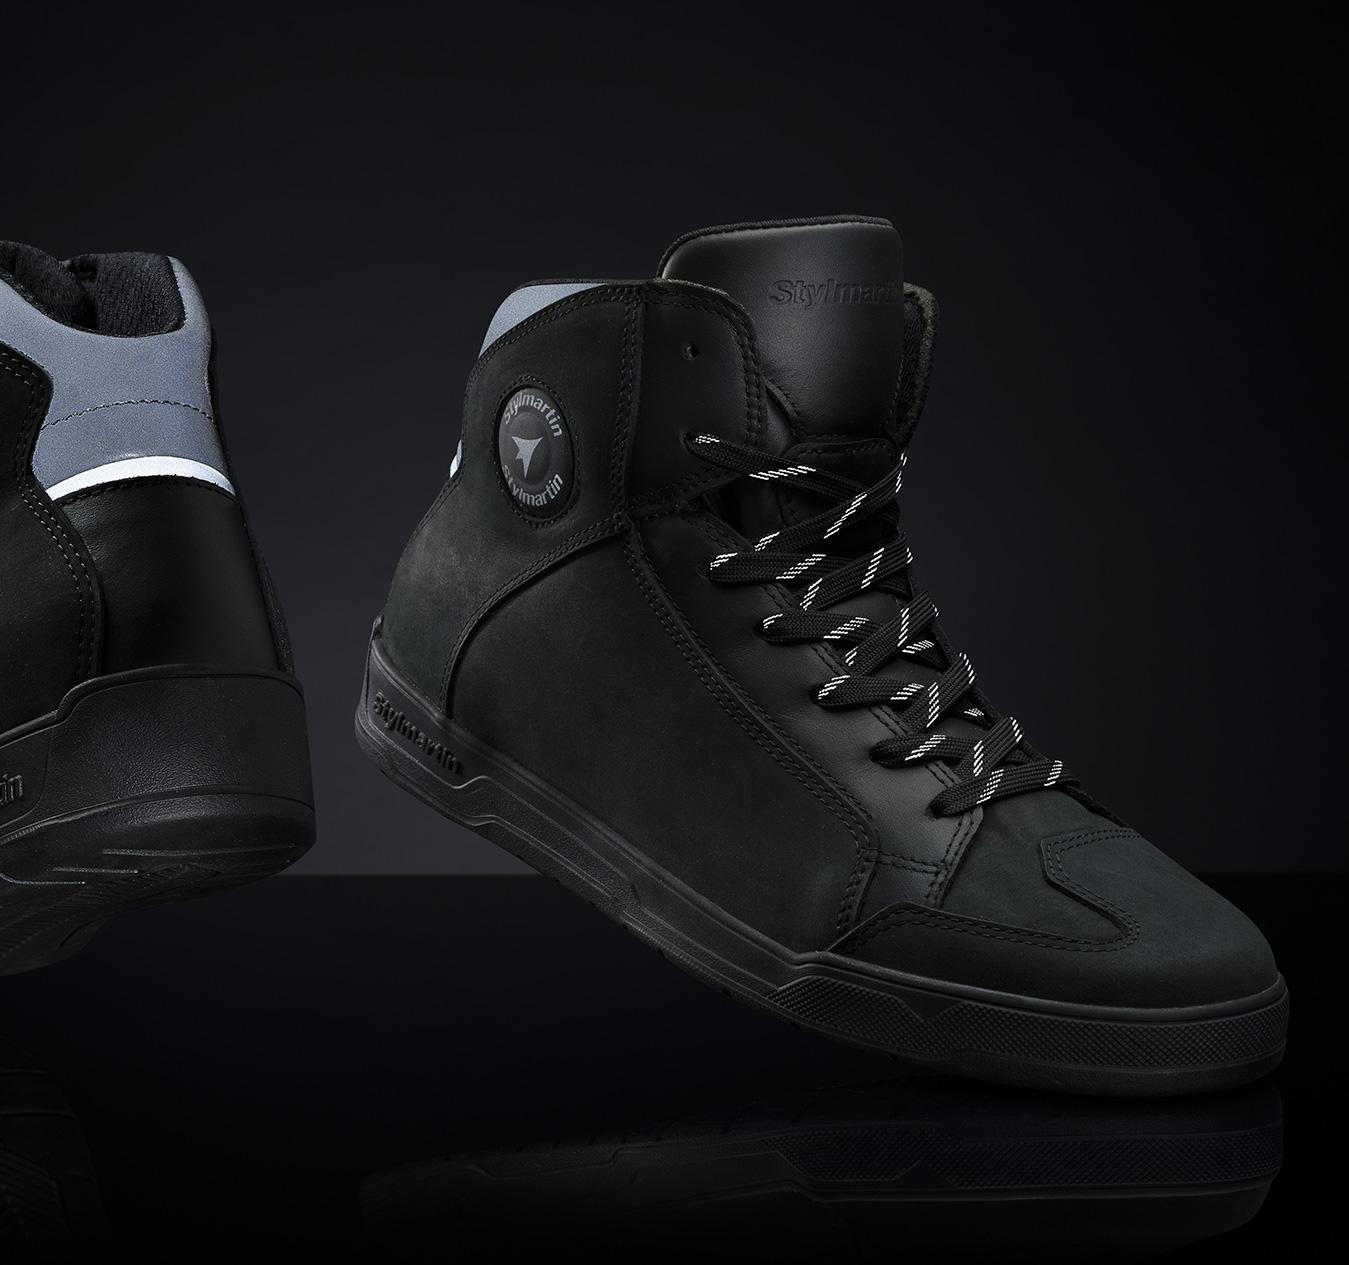 Stylmartin presenta le nuove sneakers MATT WP